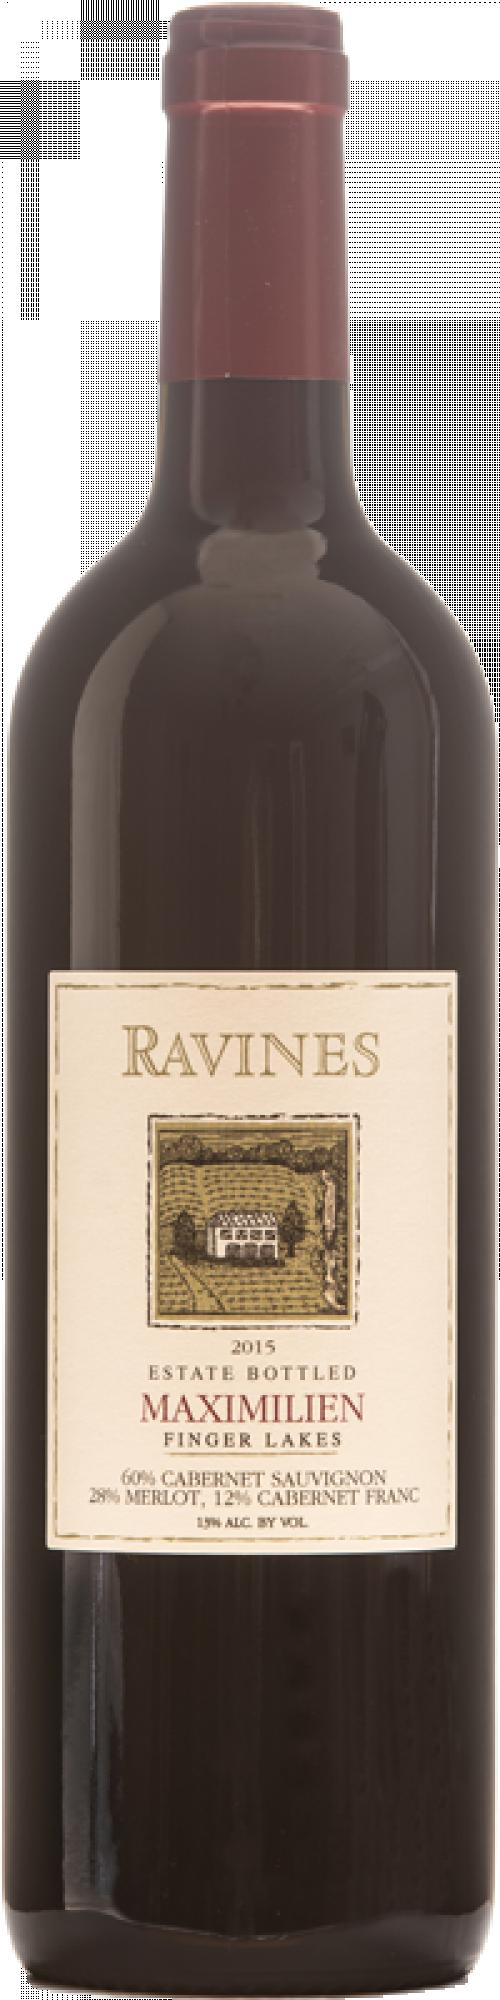 2016 Ravines Maximilien 750ml